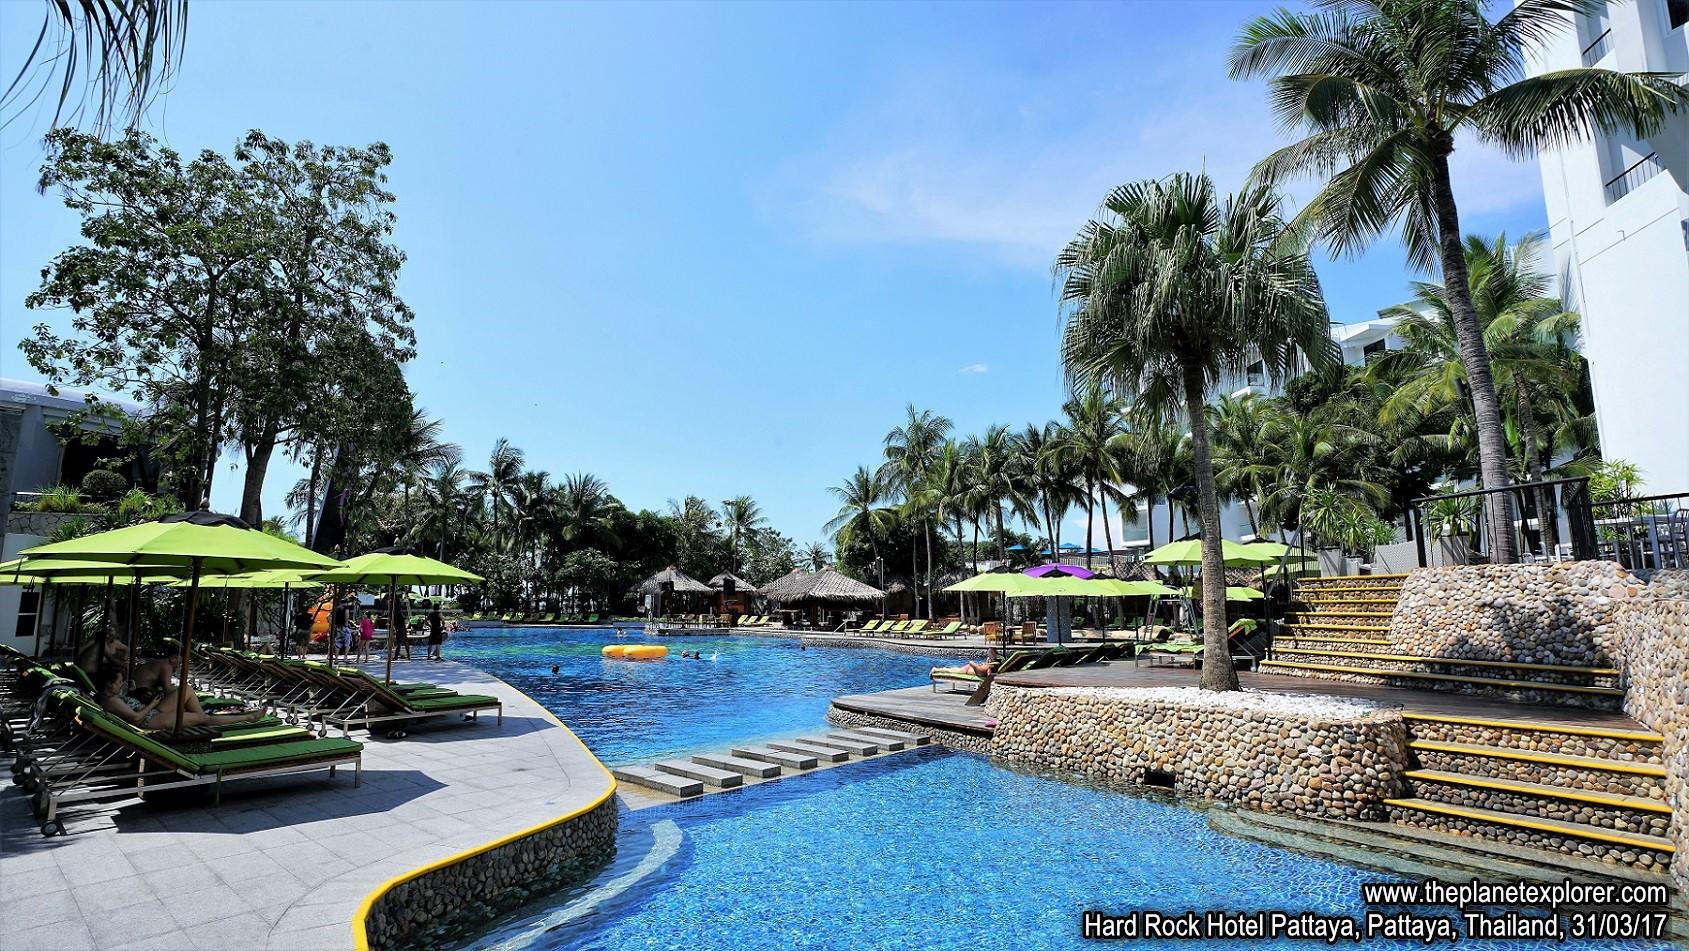 2017-03-31_1422_Thailand_Pattaya_Hard Rock Hotel Pattaya_DSC03891_s7R2_LR_@